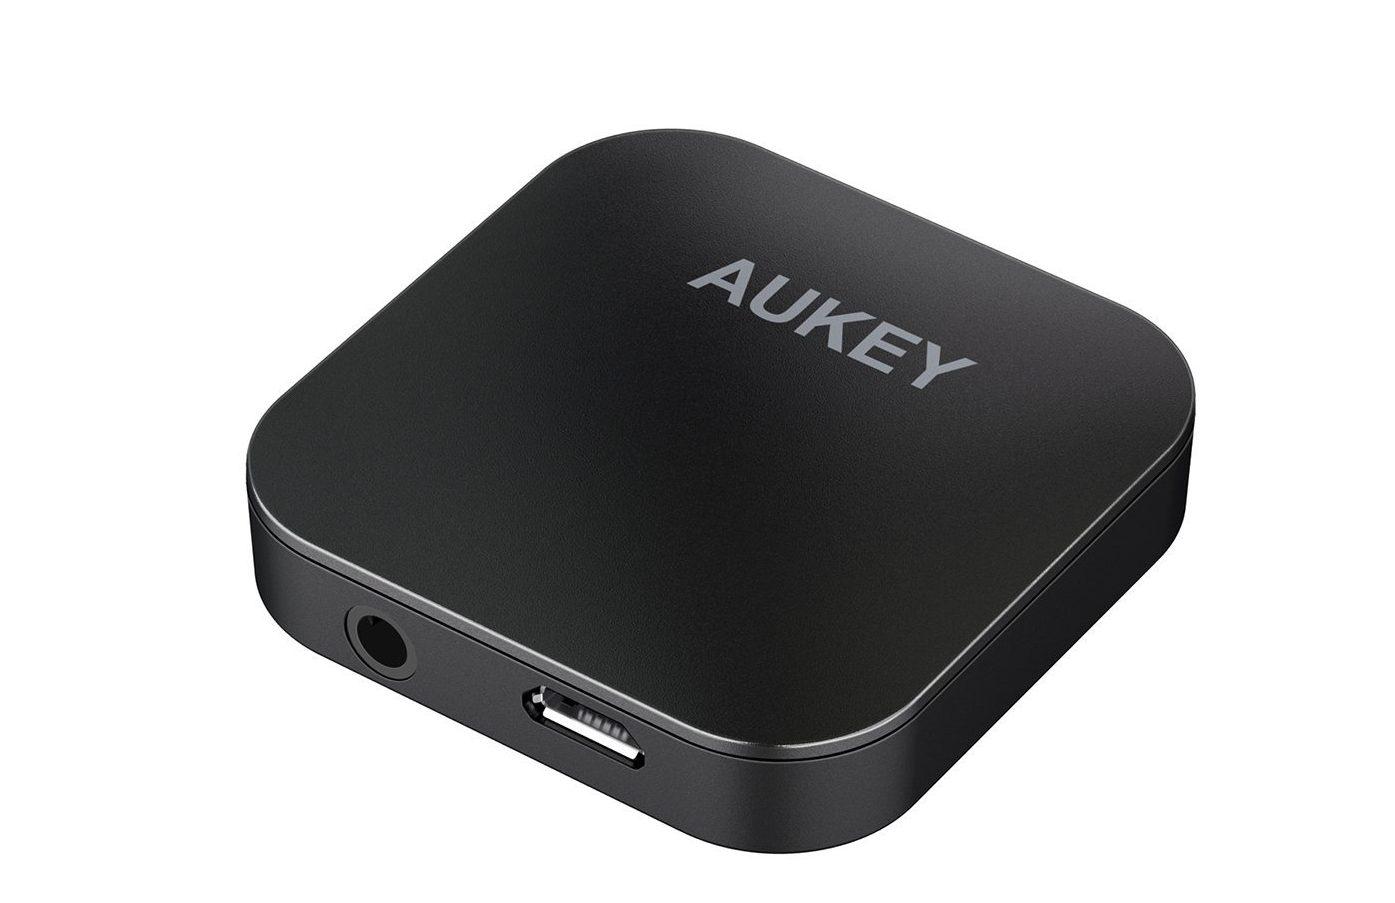 AUKEY audio transmitter